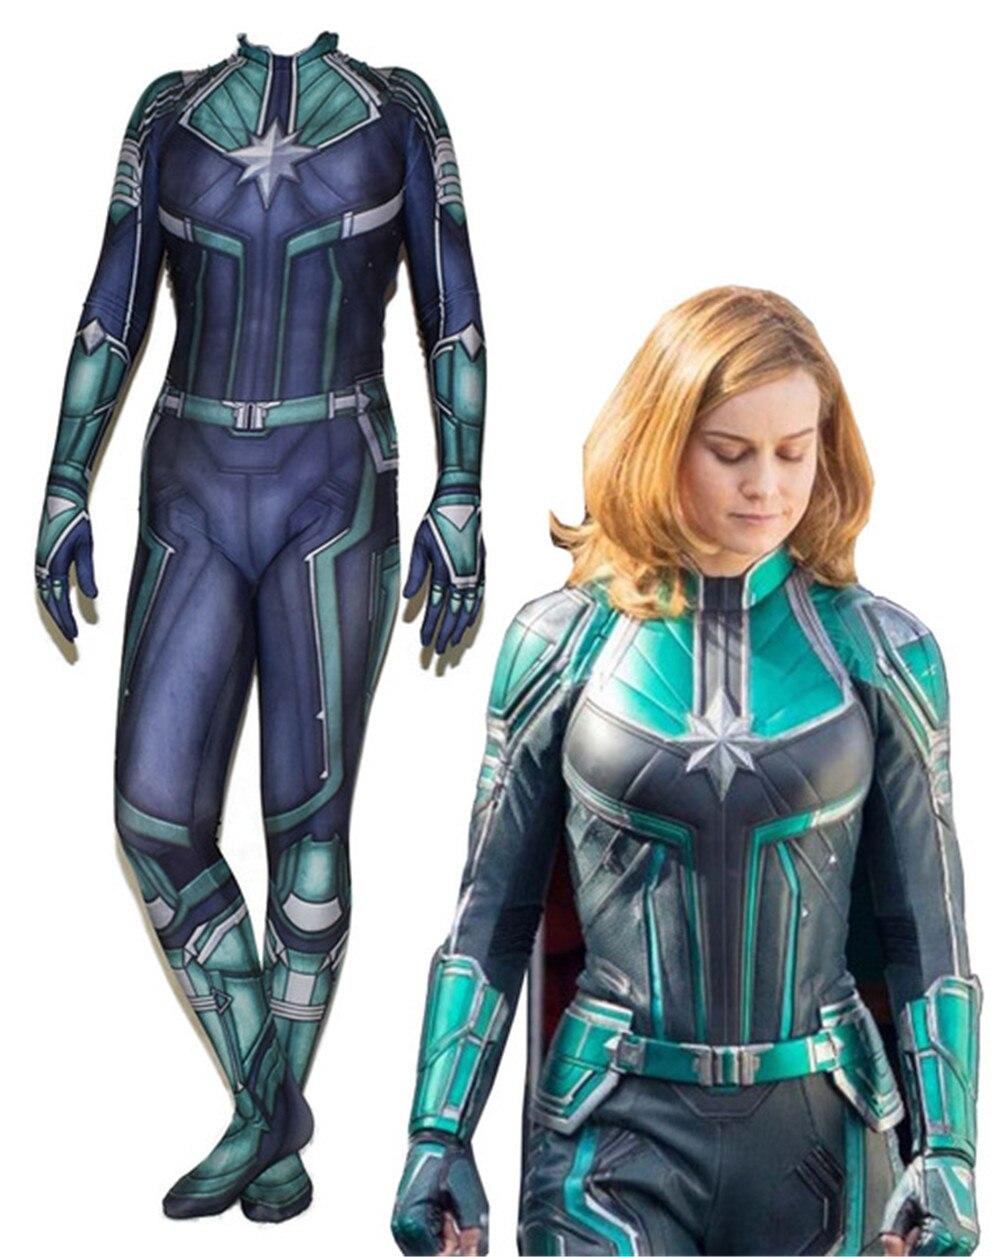 Avengers Woman Captain Ms Carol Danvers Cosplay Costume hero Bodysuit Suit Jumpsuits for Halloween Purim